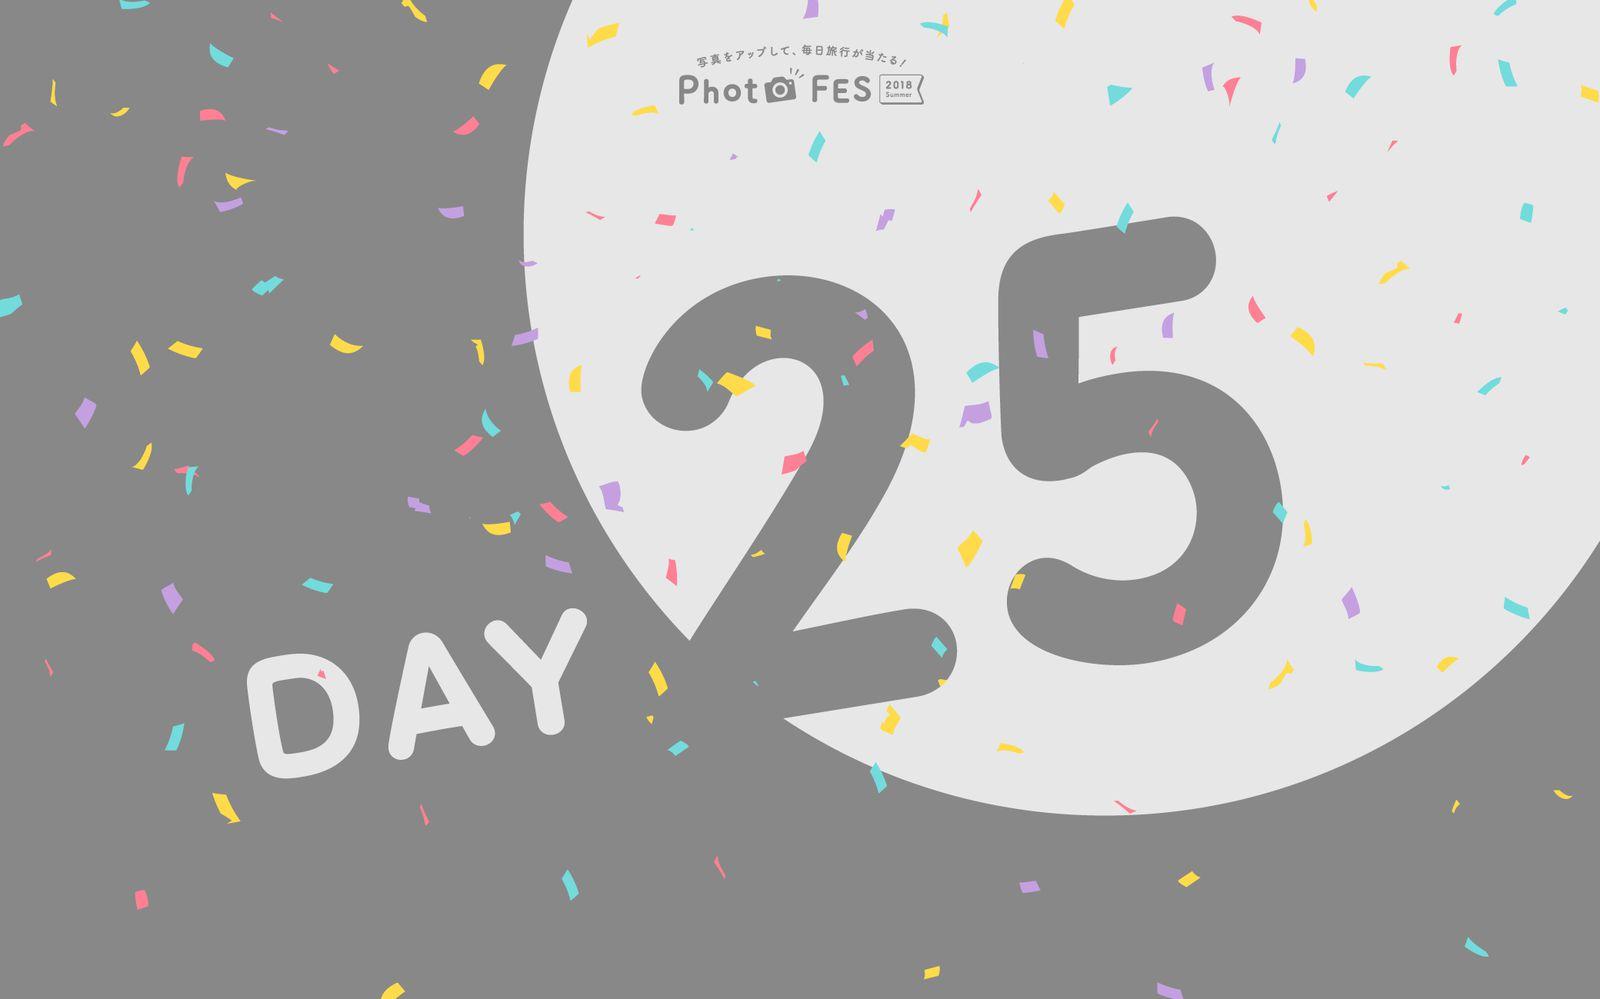 【DAY25】「Photo FES 2018」7月20日投稿分であたる賞品&受賞者発表